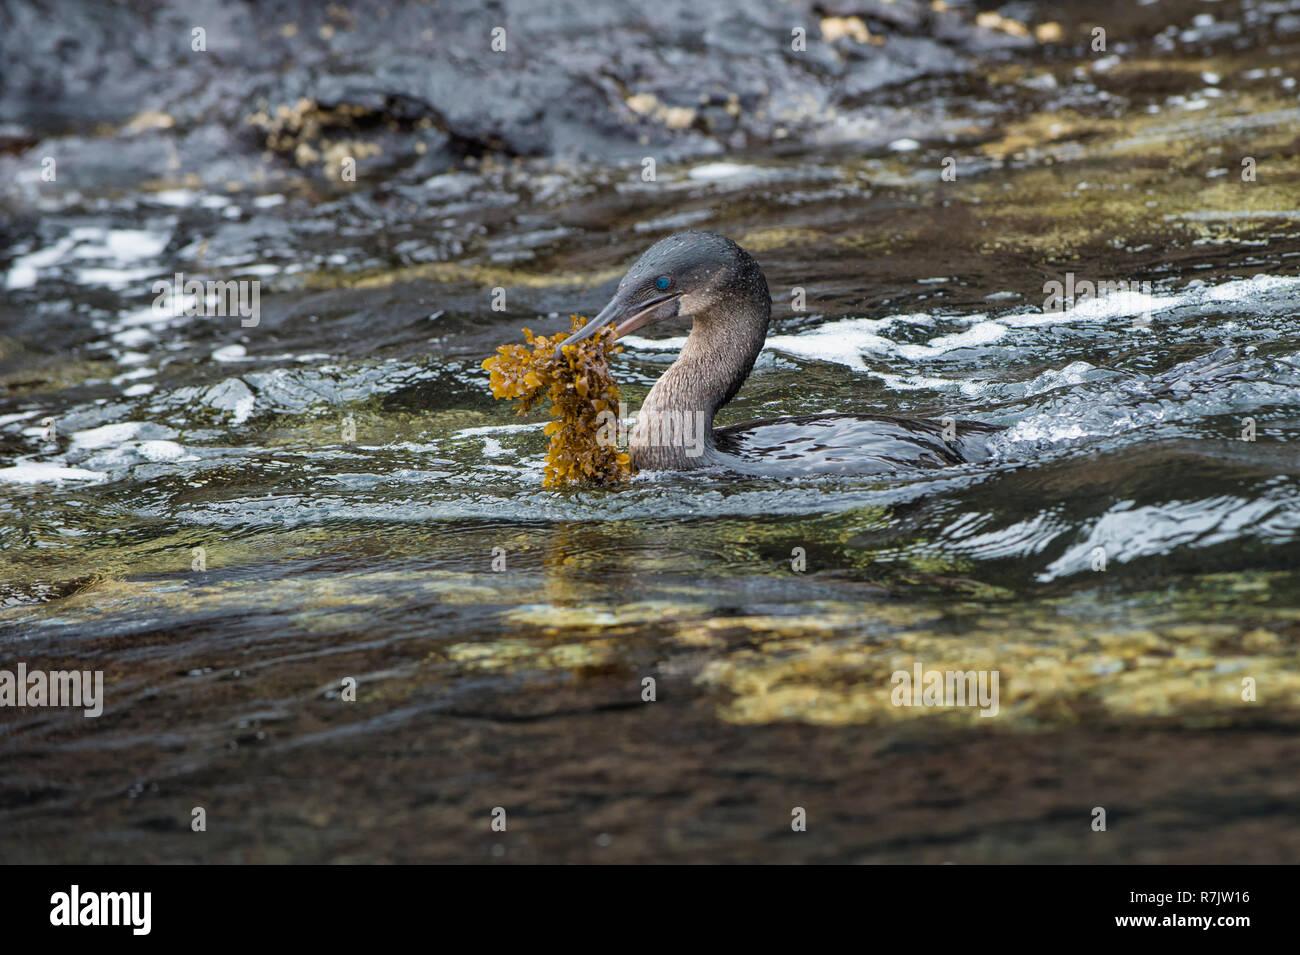 Flightless Cormorant (Phalacrocorax harrisi) carrying nesting material, Tagus Cove, Isabela Island, Galapagosinseln, Ecuador - Stock Image